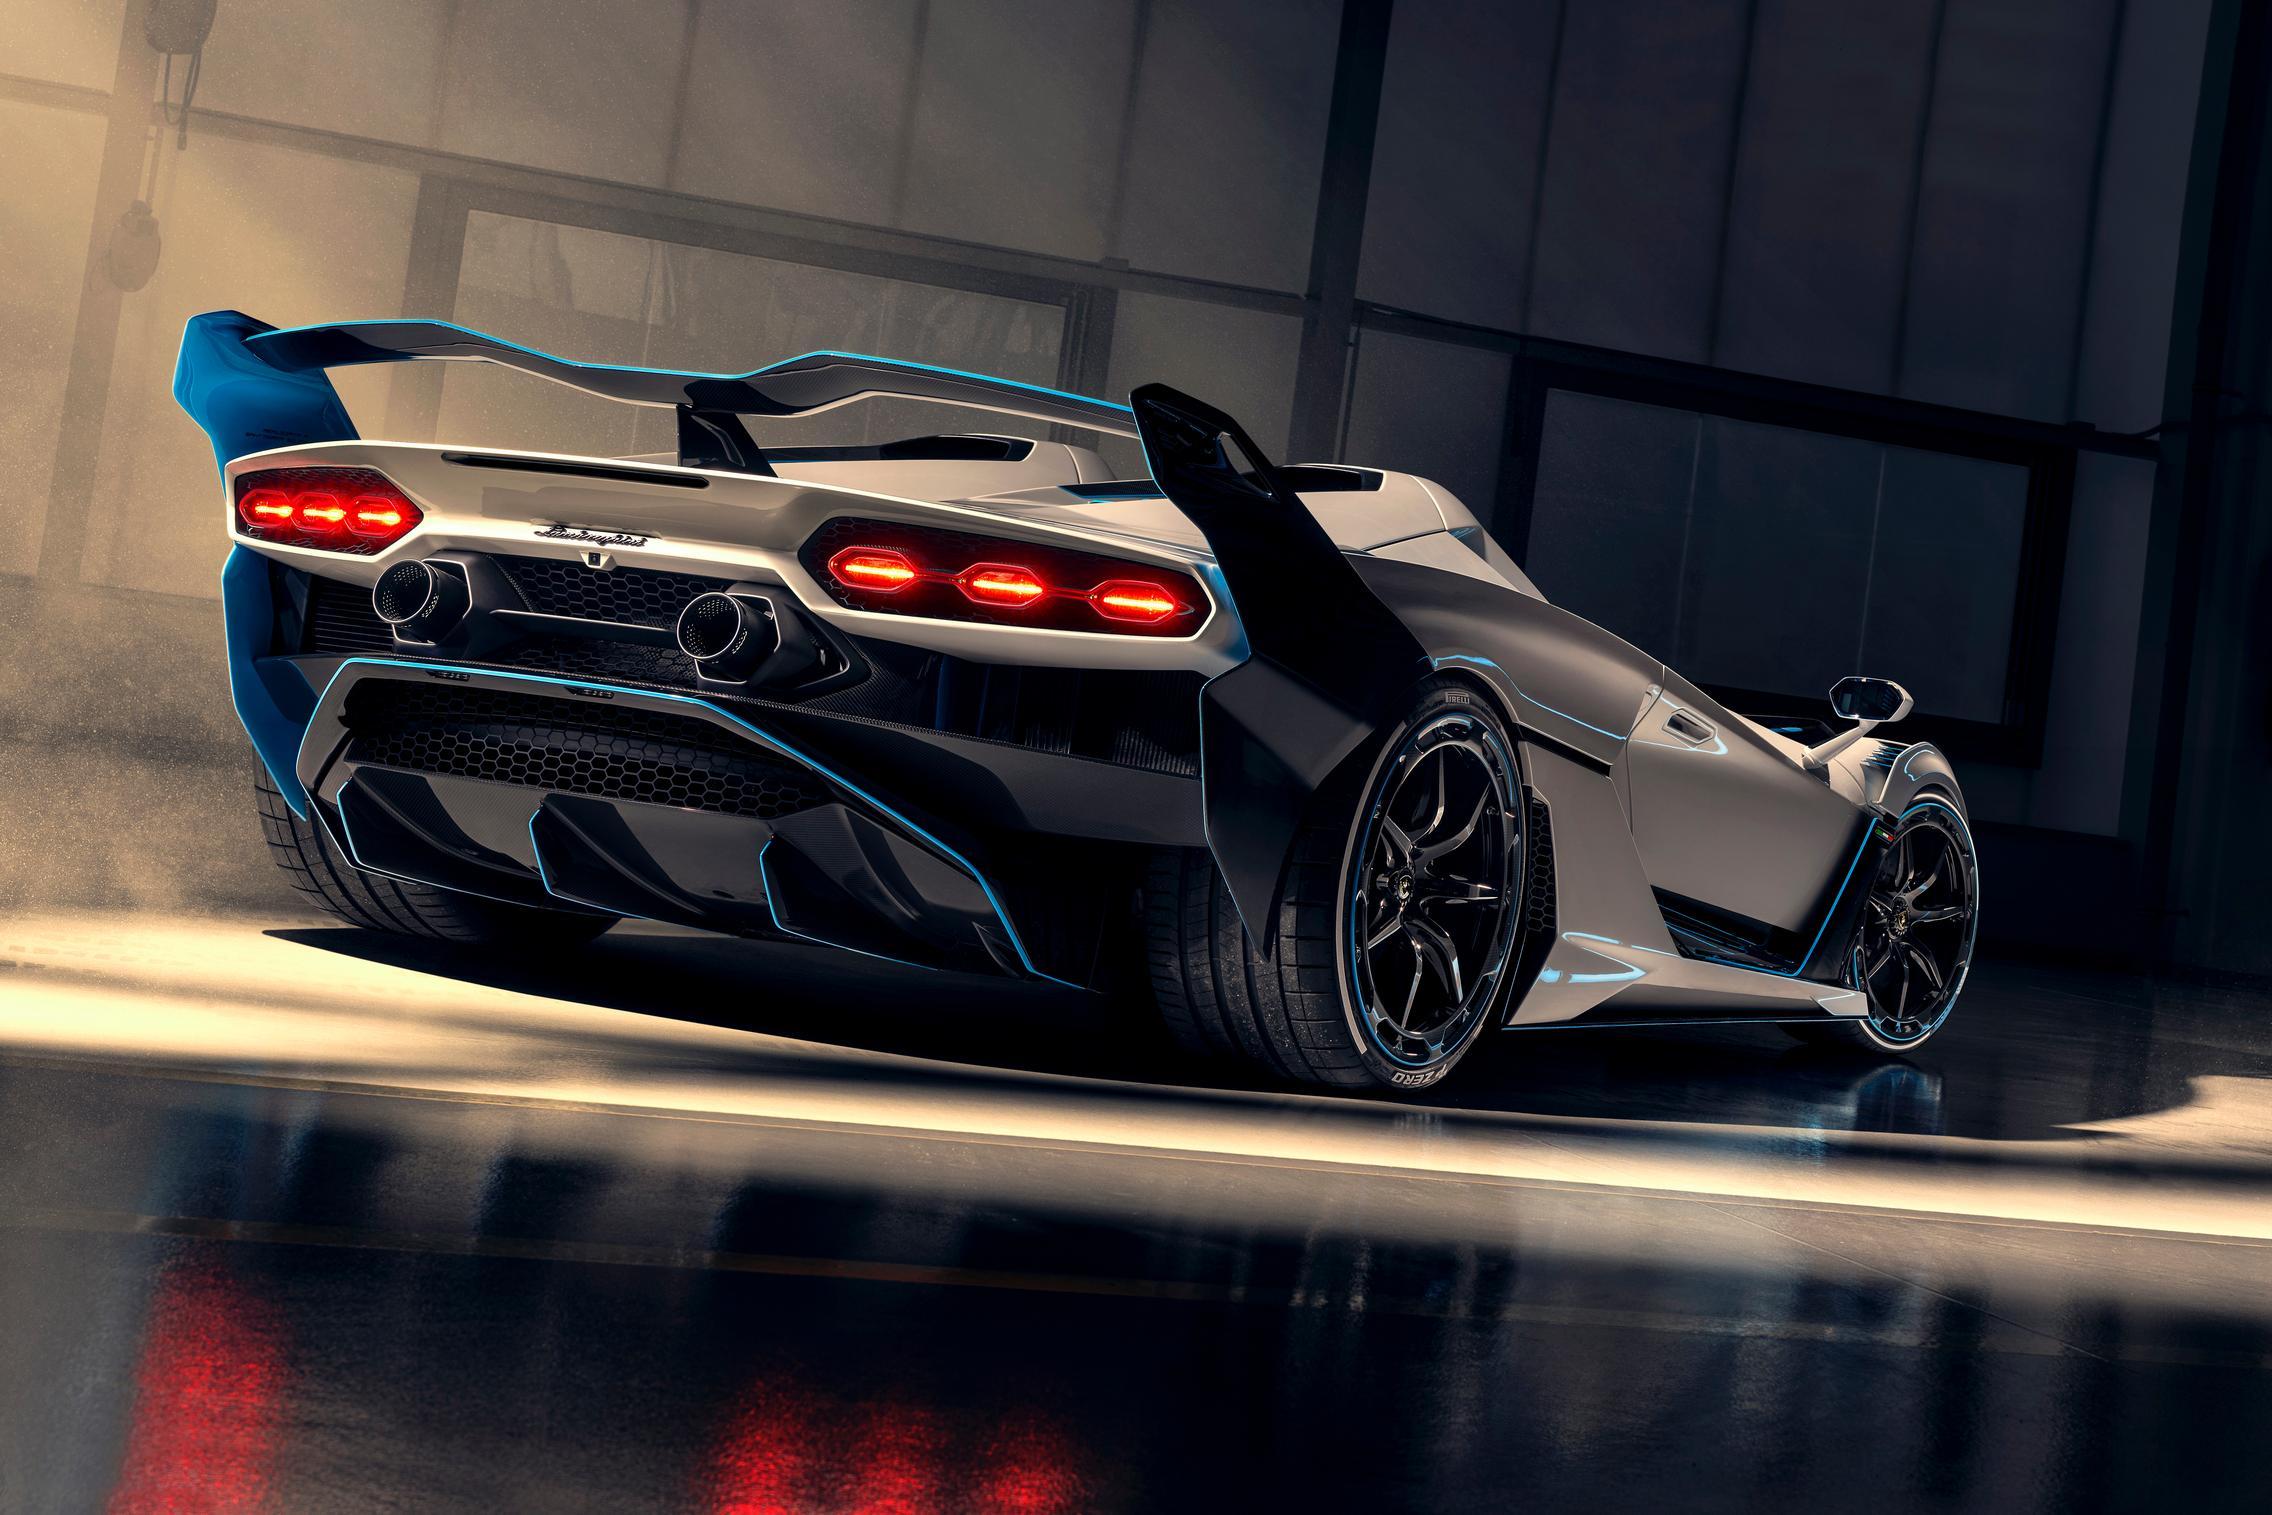 Lamborghini SC20 for sale